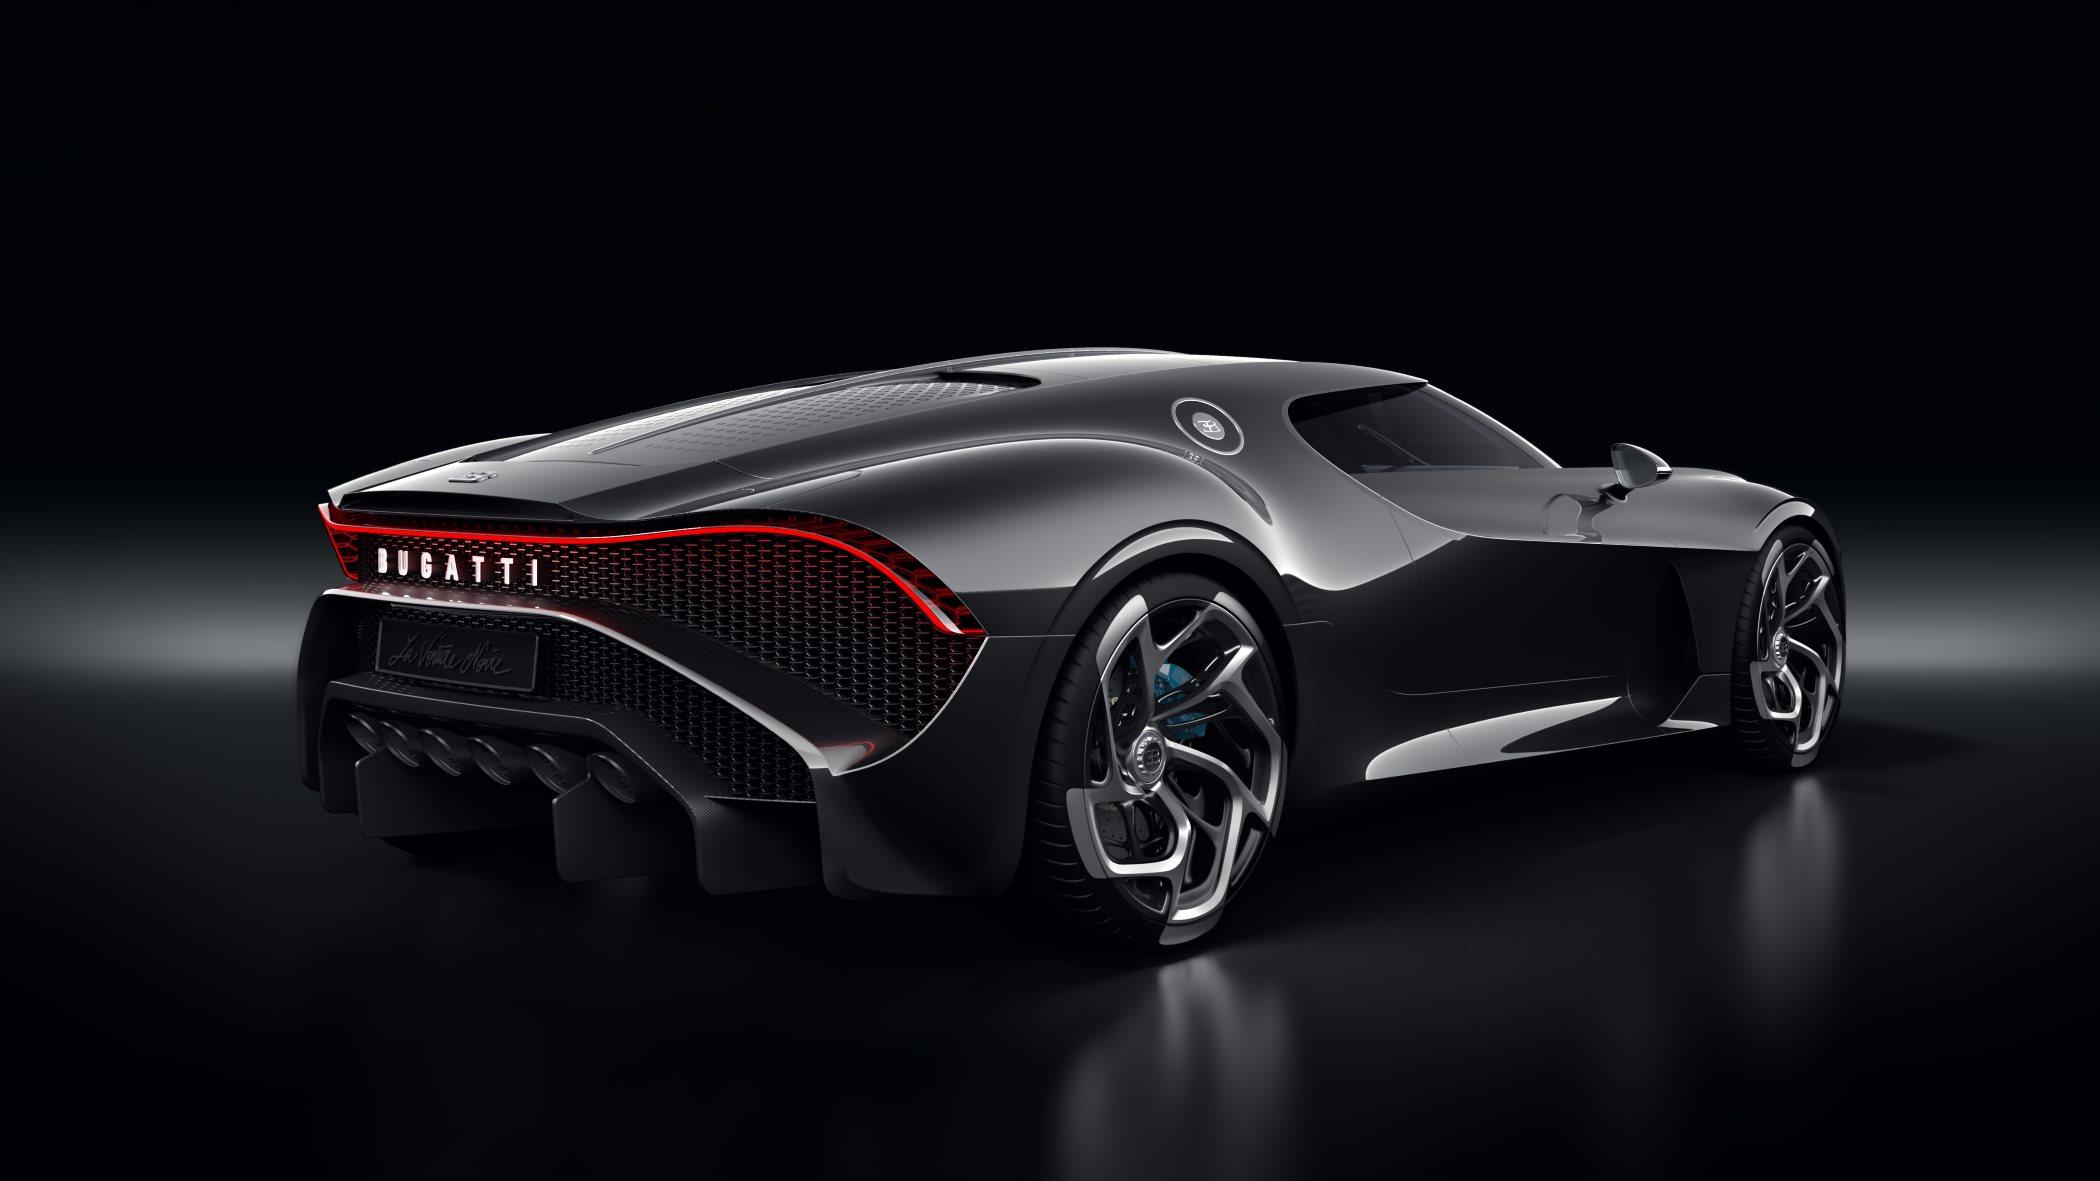 'La Voiture Noire' by Bugatti